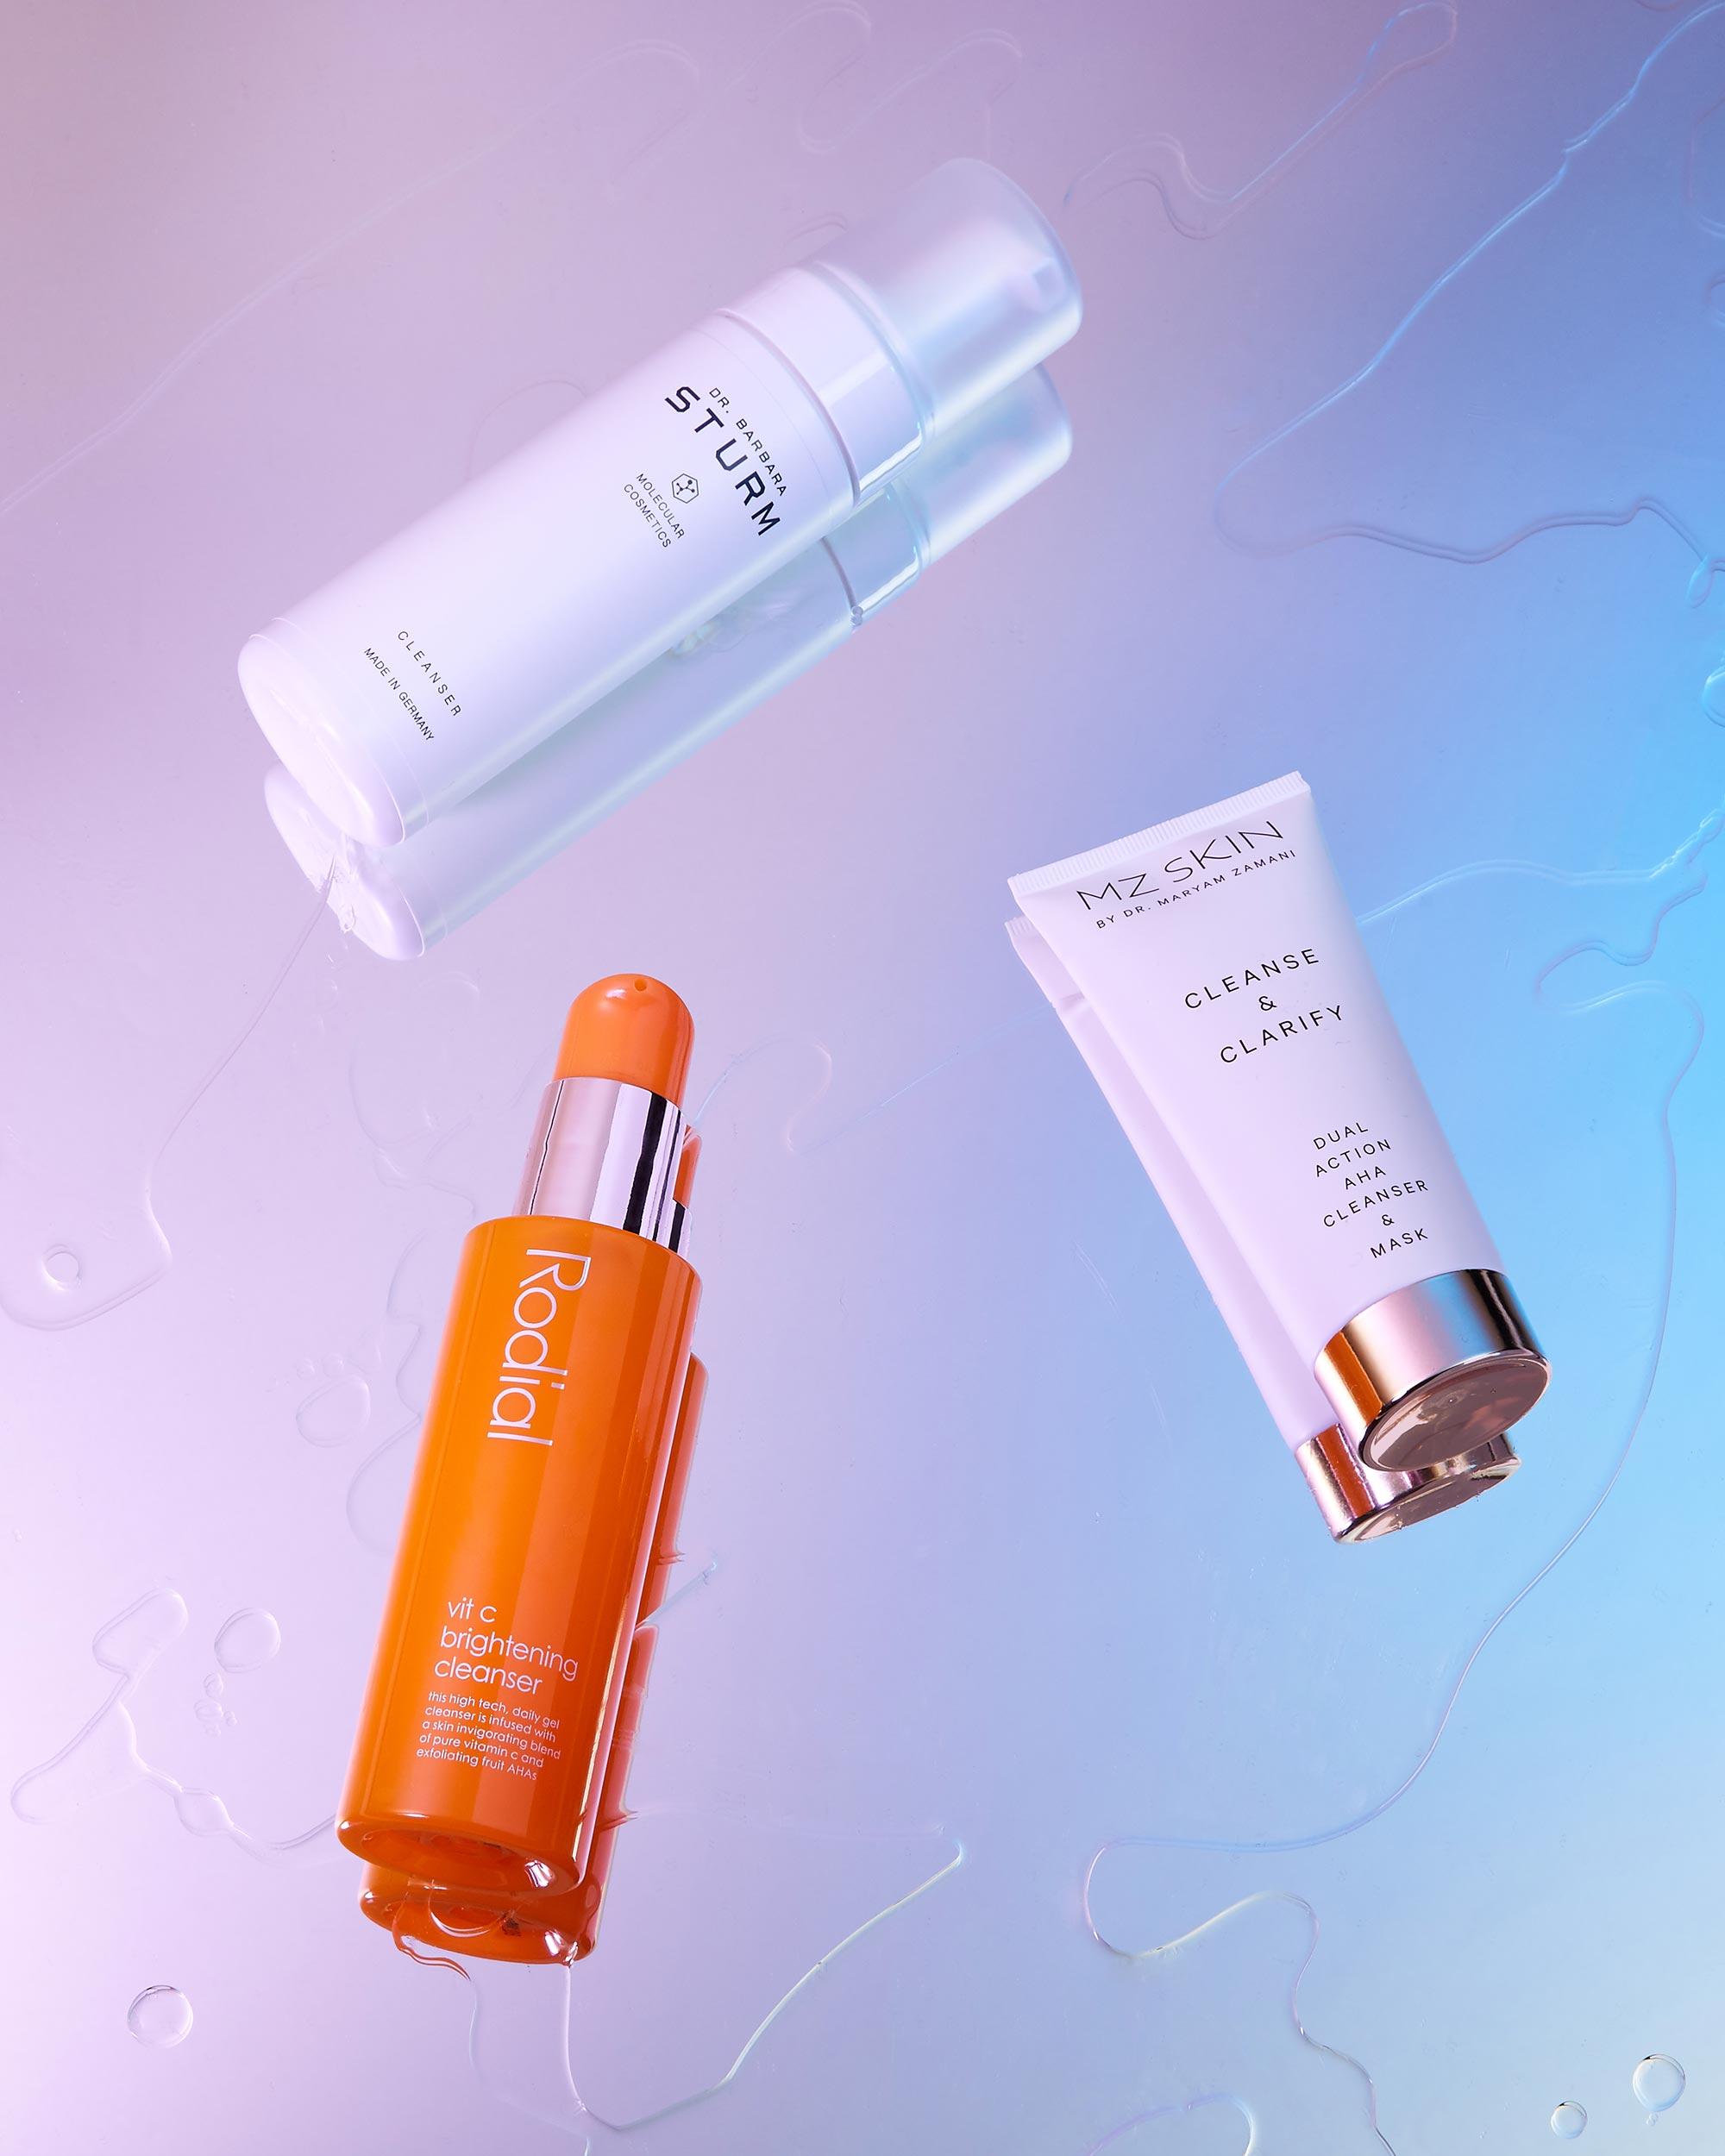 Dr-Barbara-Sturm-Cleanser-Mz-Skin-Maryam-Zamani-Cleanse-Clarify-Rodial-Vit-C-Brightening-Cleanser-Creative-Photography.jpg